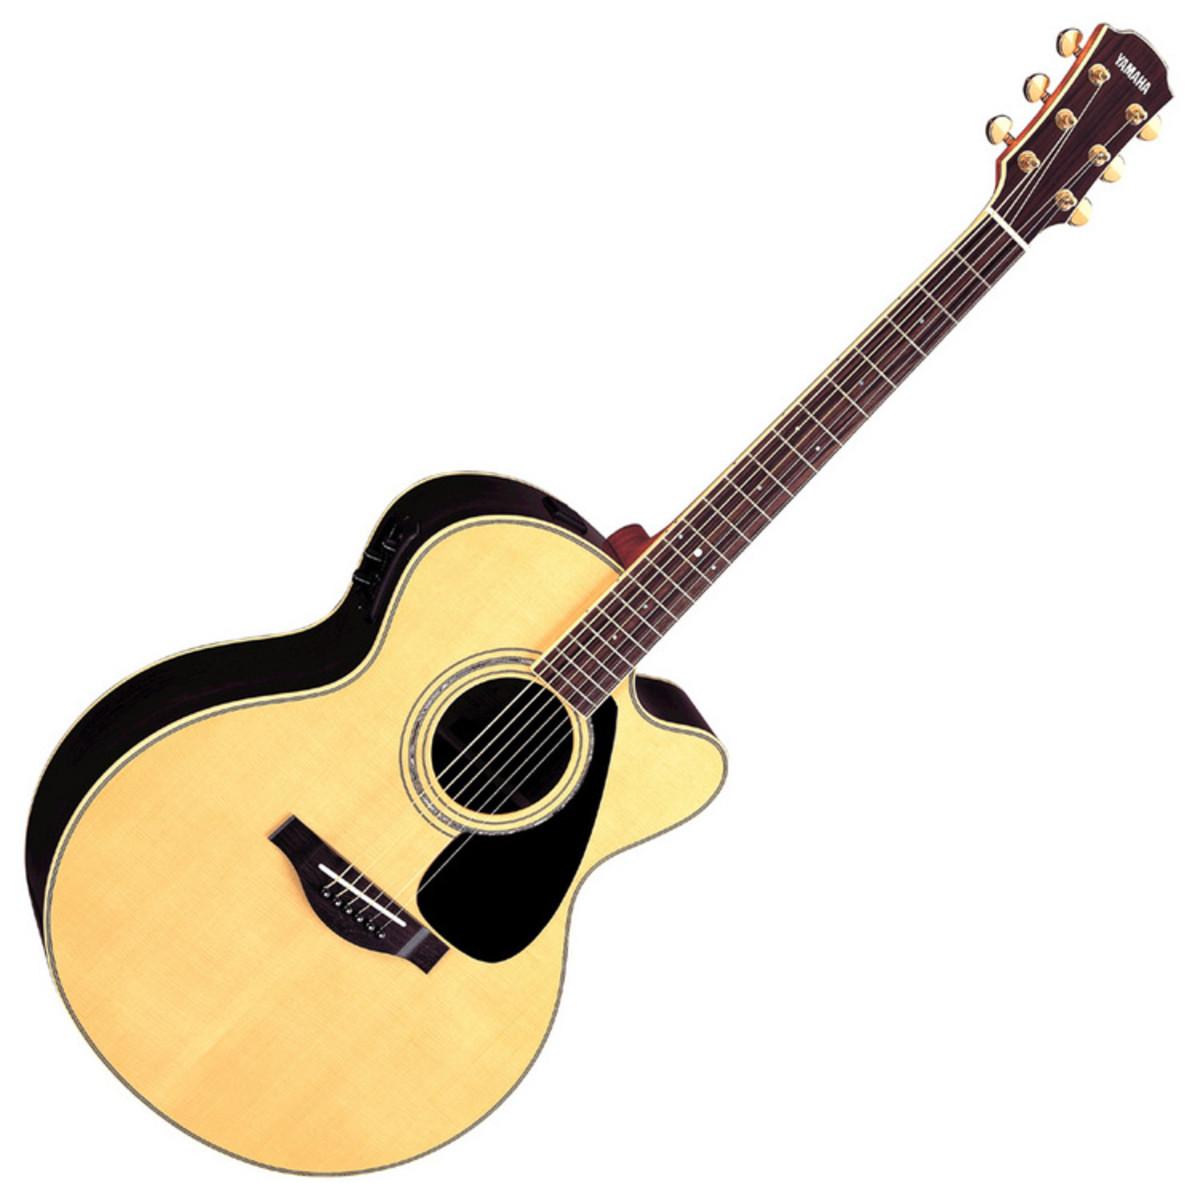 yamaha ljx6c guitare acoustique caisse en bois massif. Black Bedroom Furniture Sets. Home Design Ideas